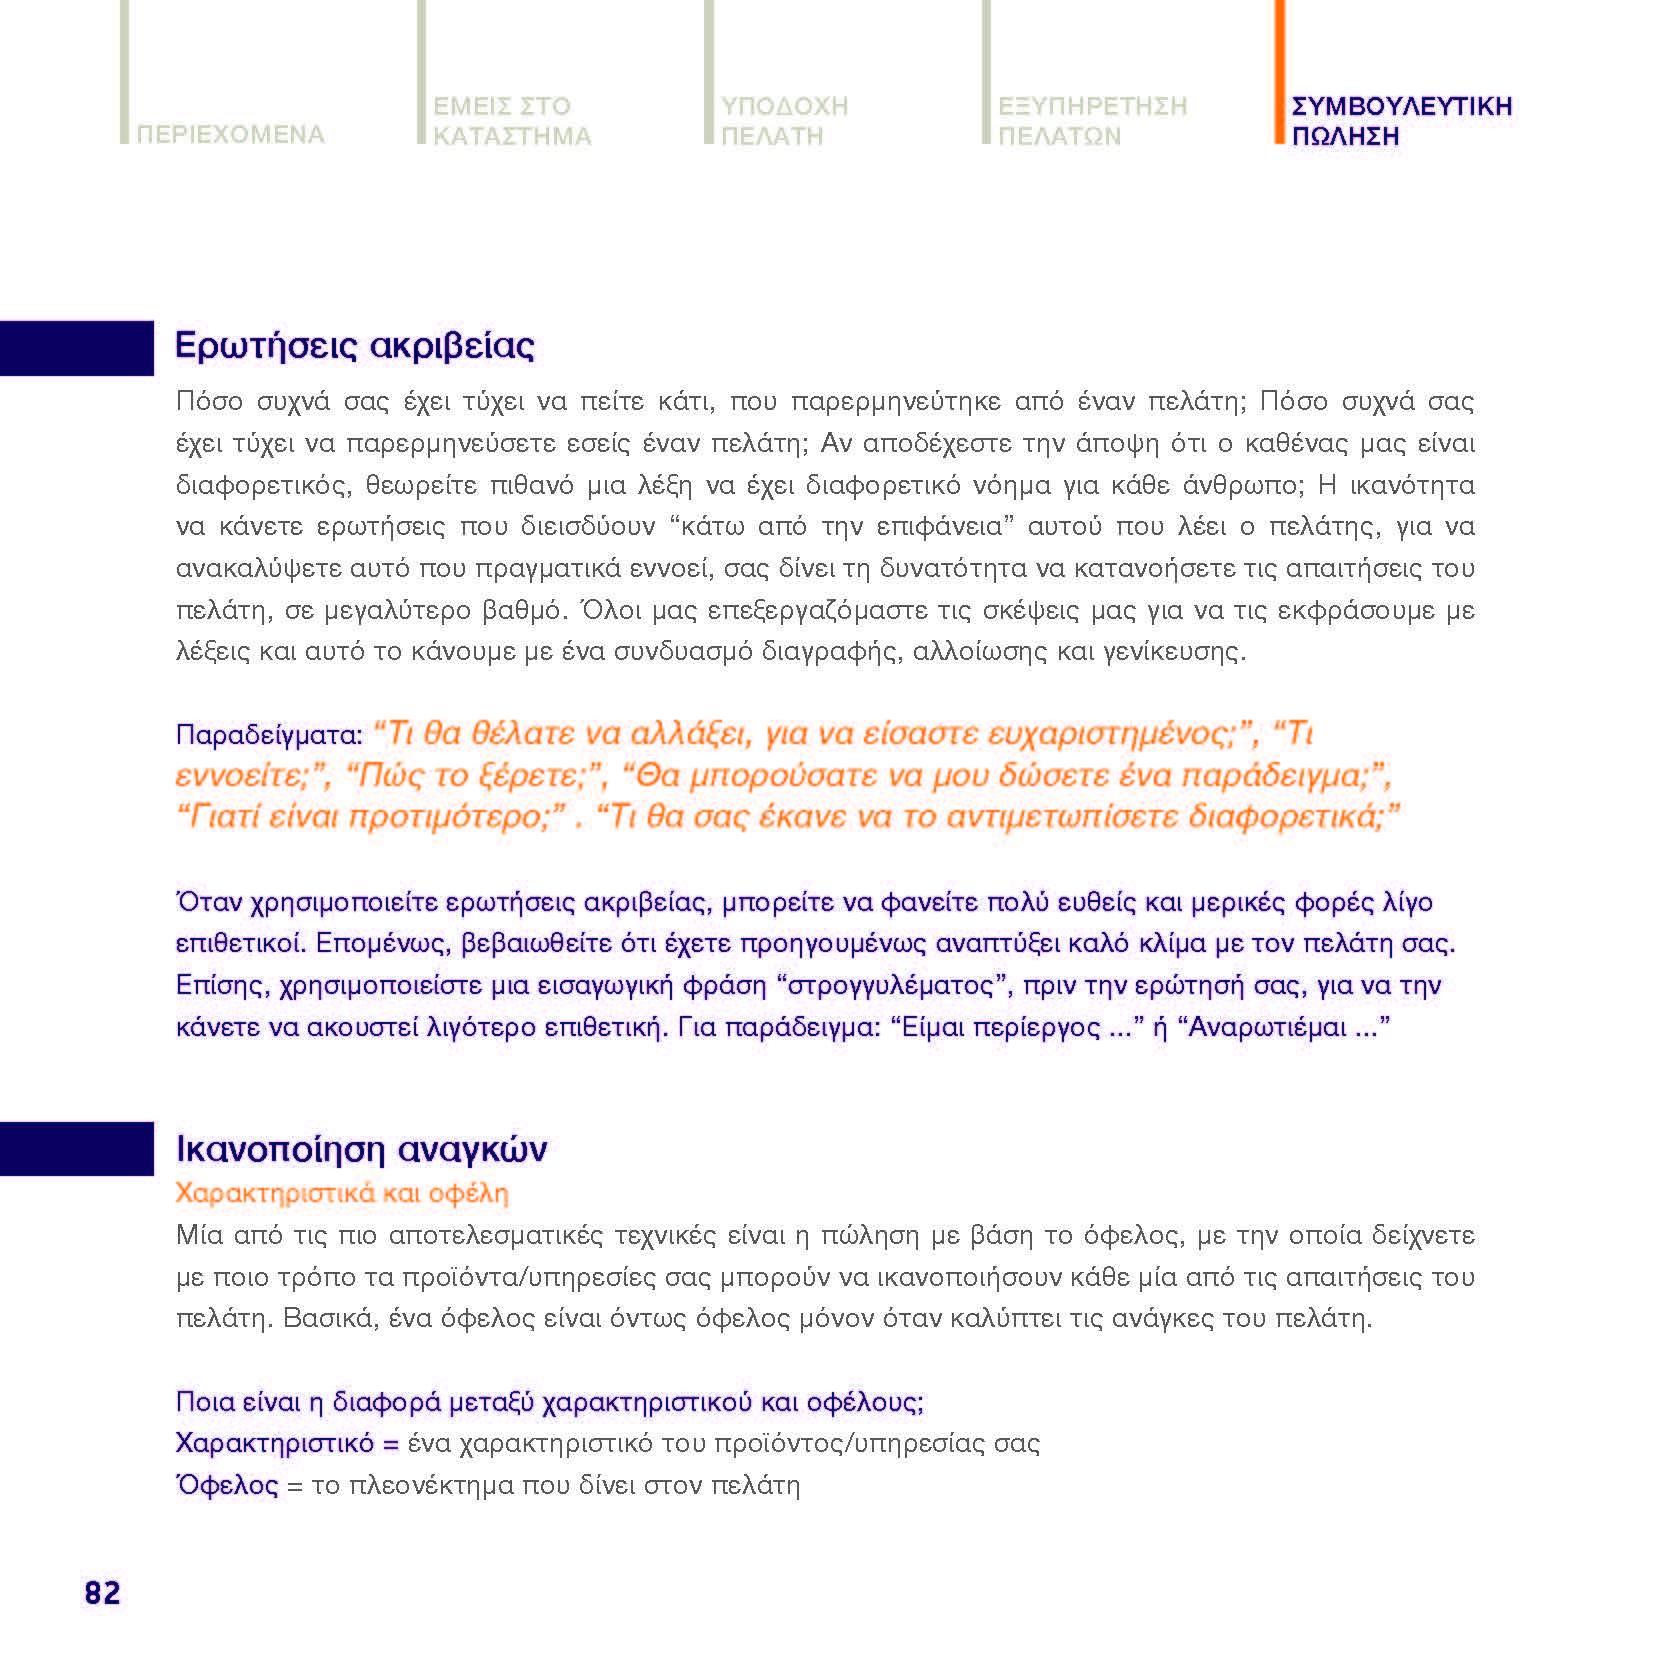 https://www.jib.gr/wp-content/uploads/2020/09/OPTIMA-BANK-BOOKLET-WEB_Page_082.jpg